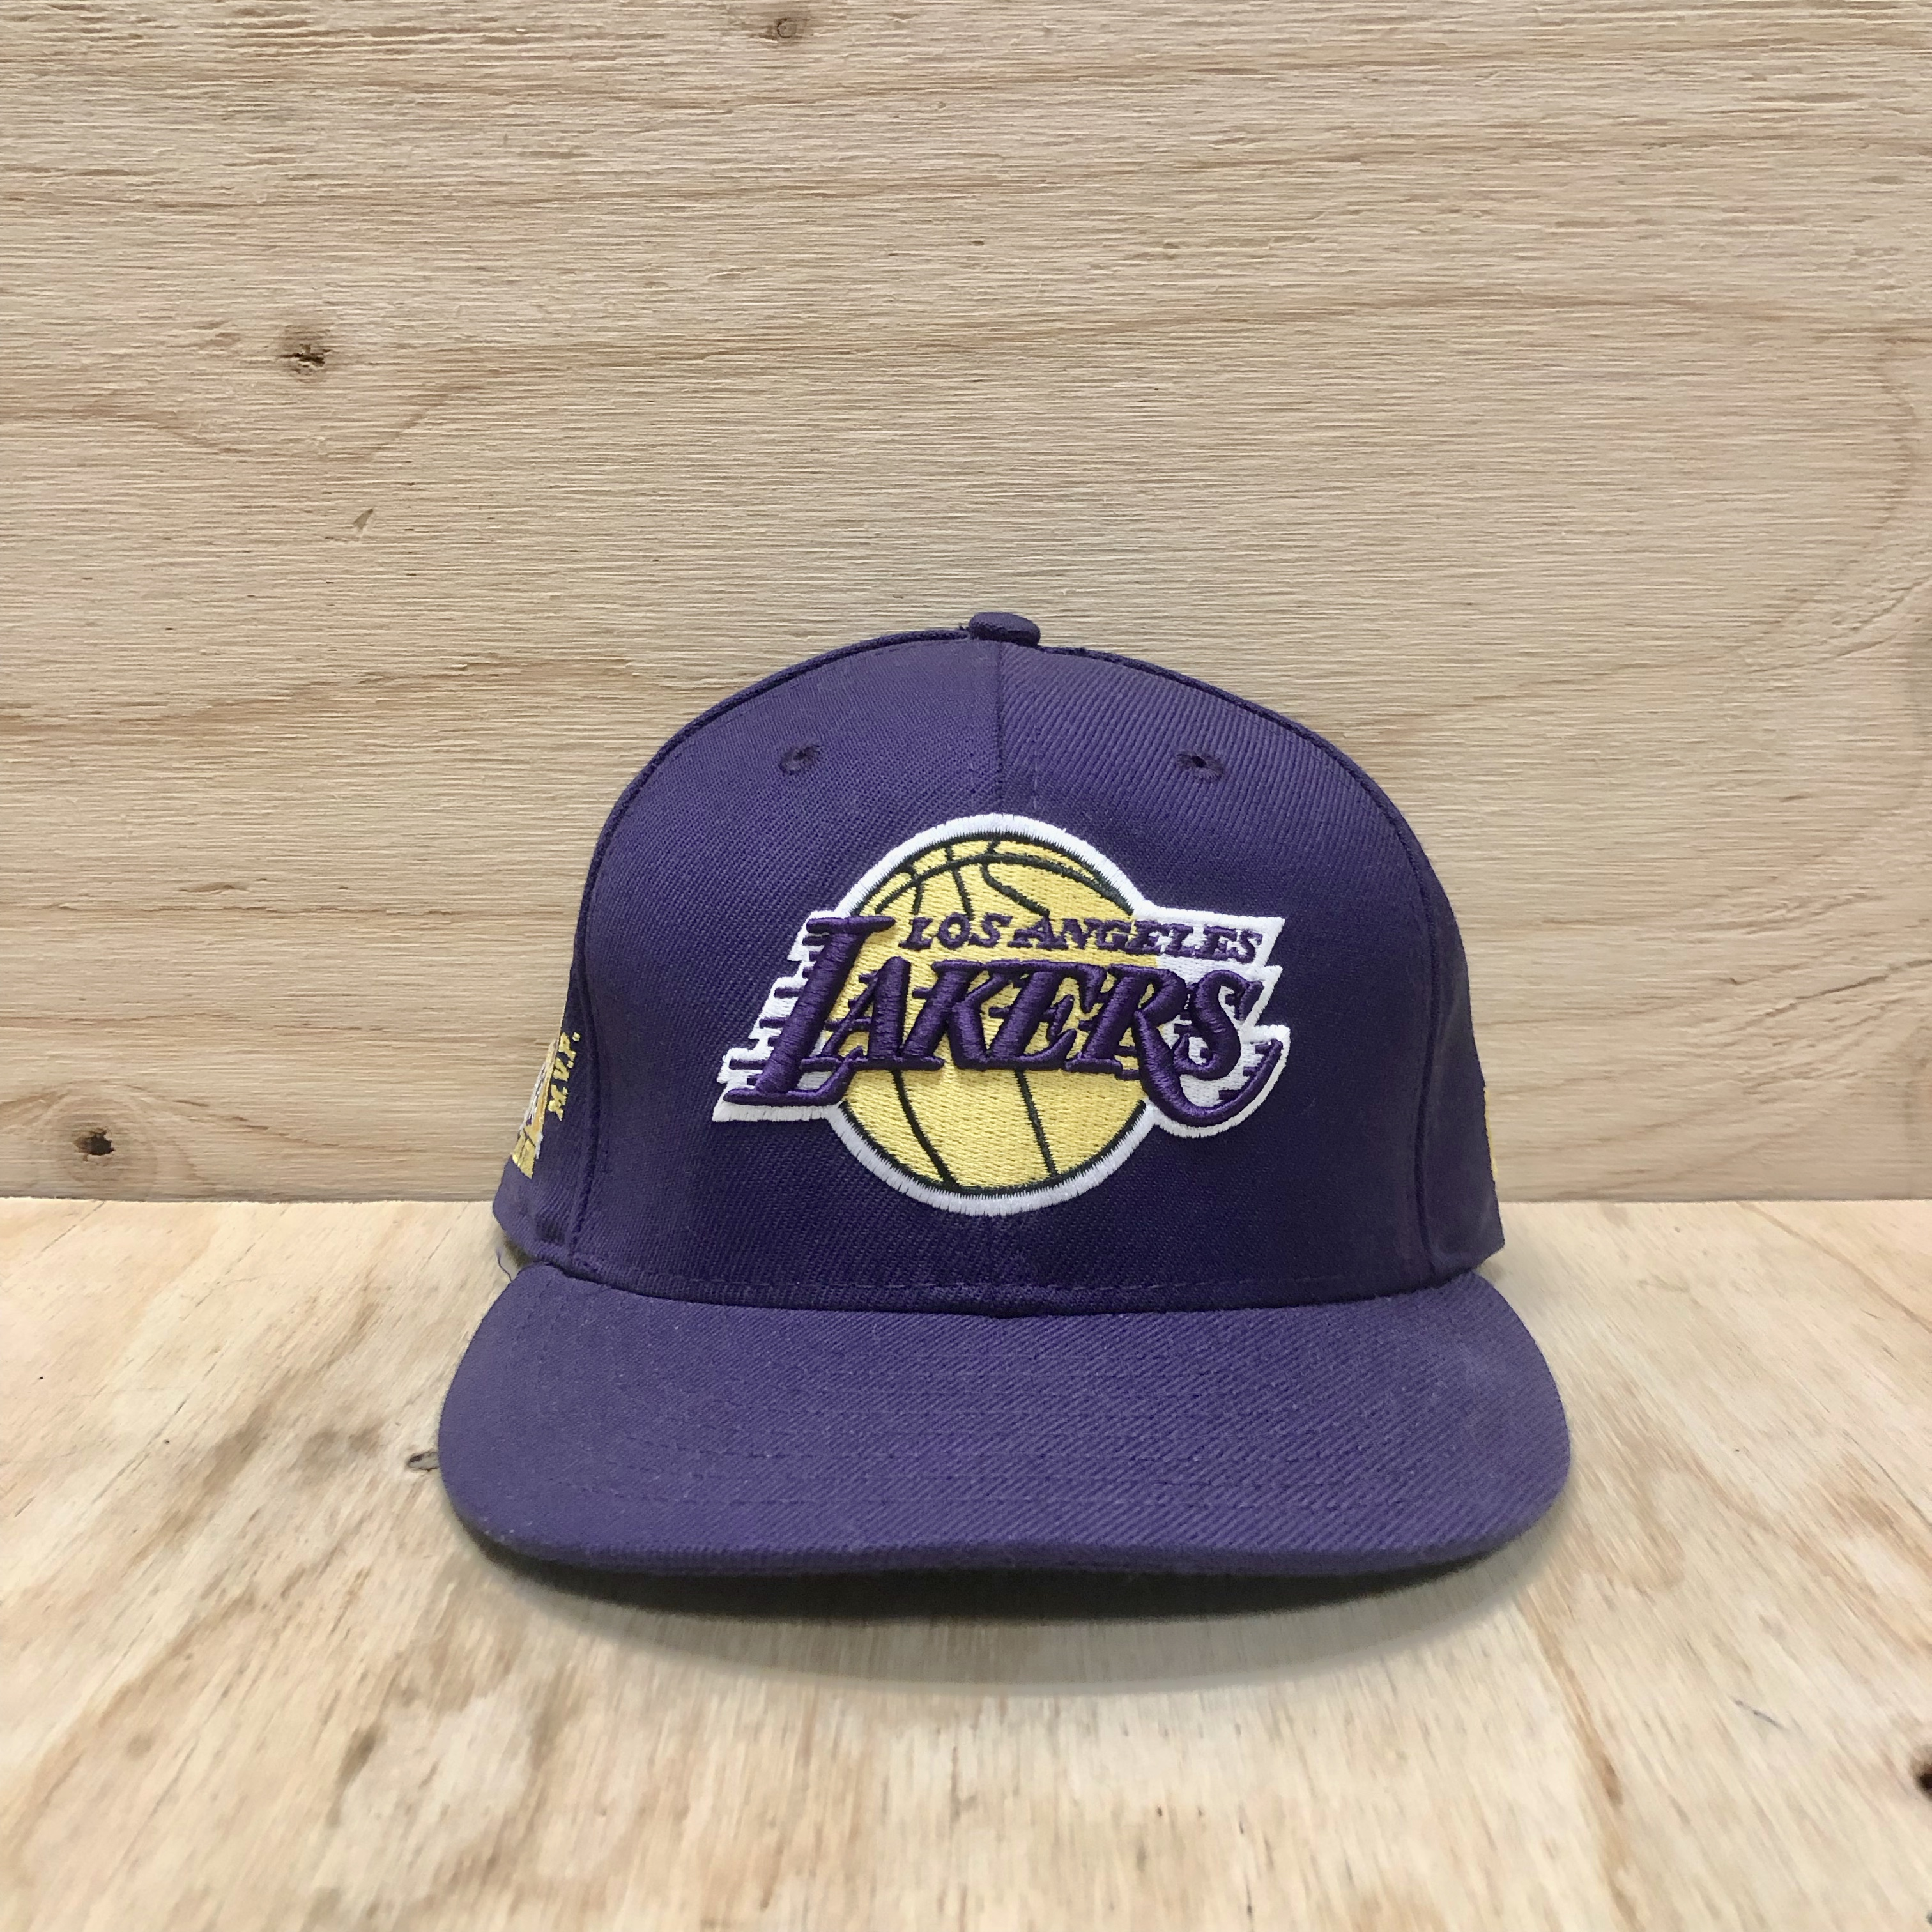 info for 575fb 81f28 New Era × Nba ×. Kobe Bryant Los Angeles Lakers Basketball Retirement  Snapback Hat